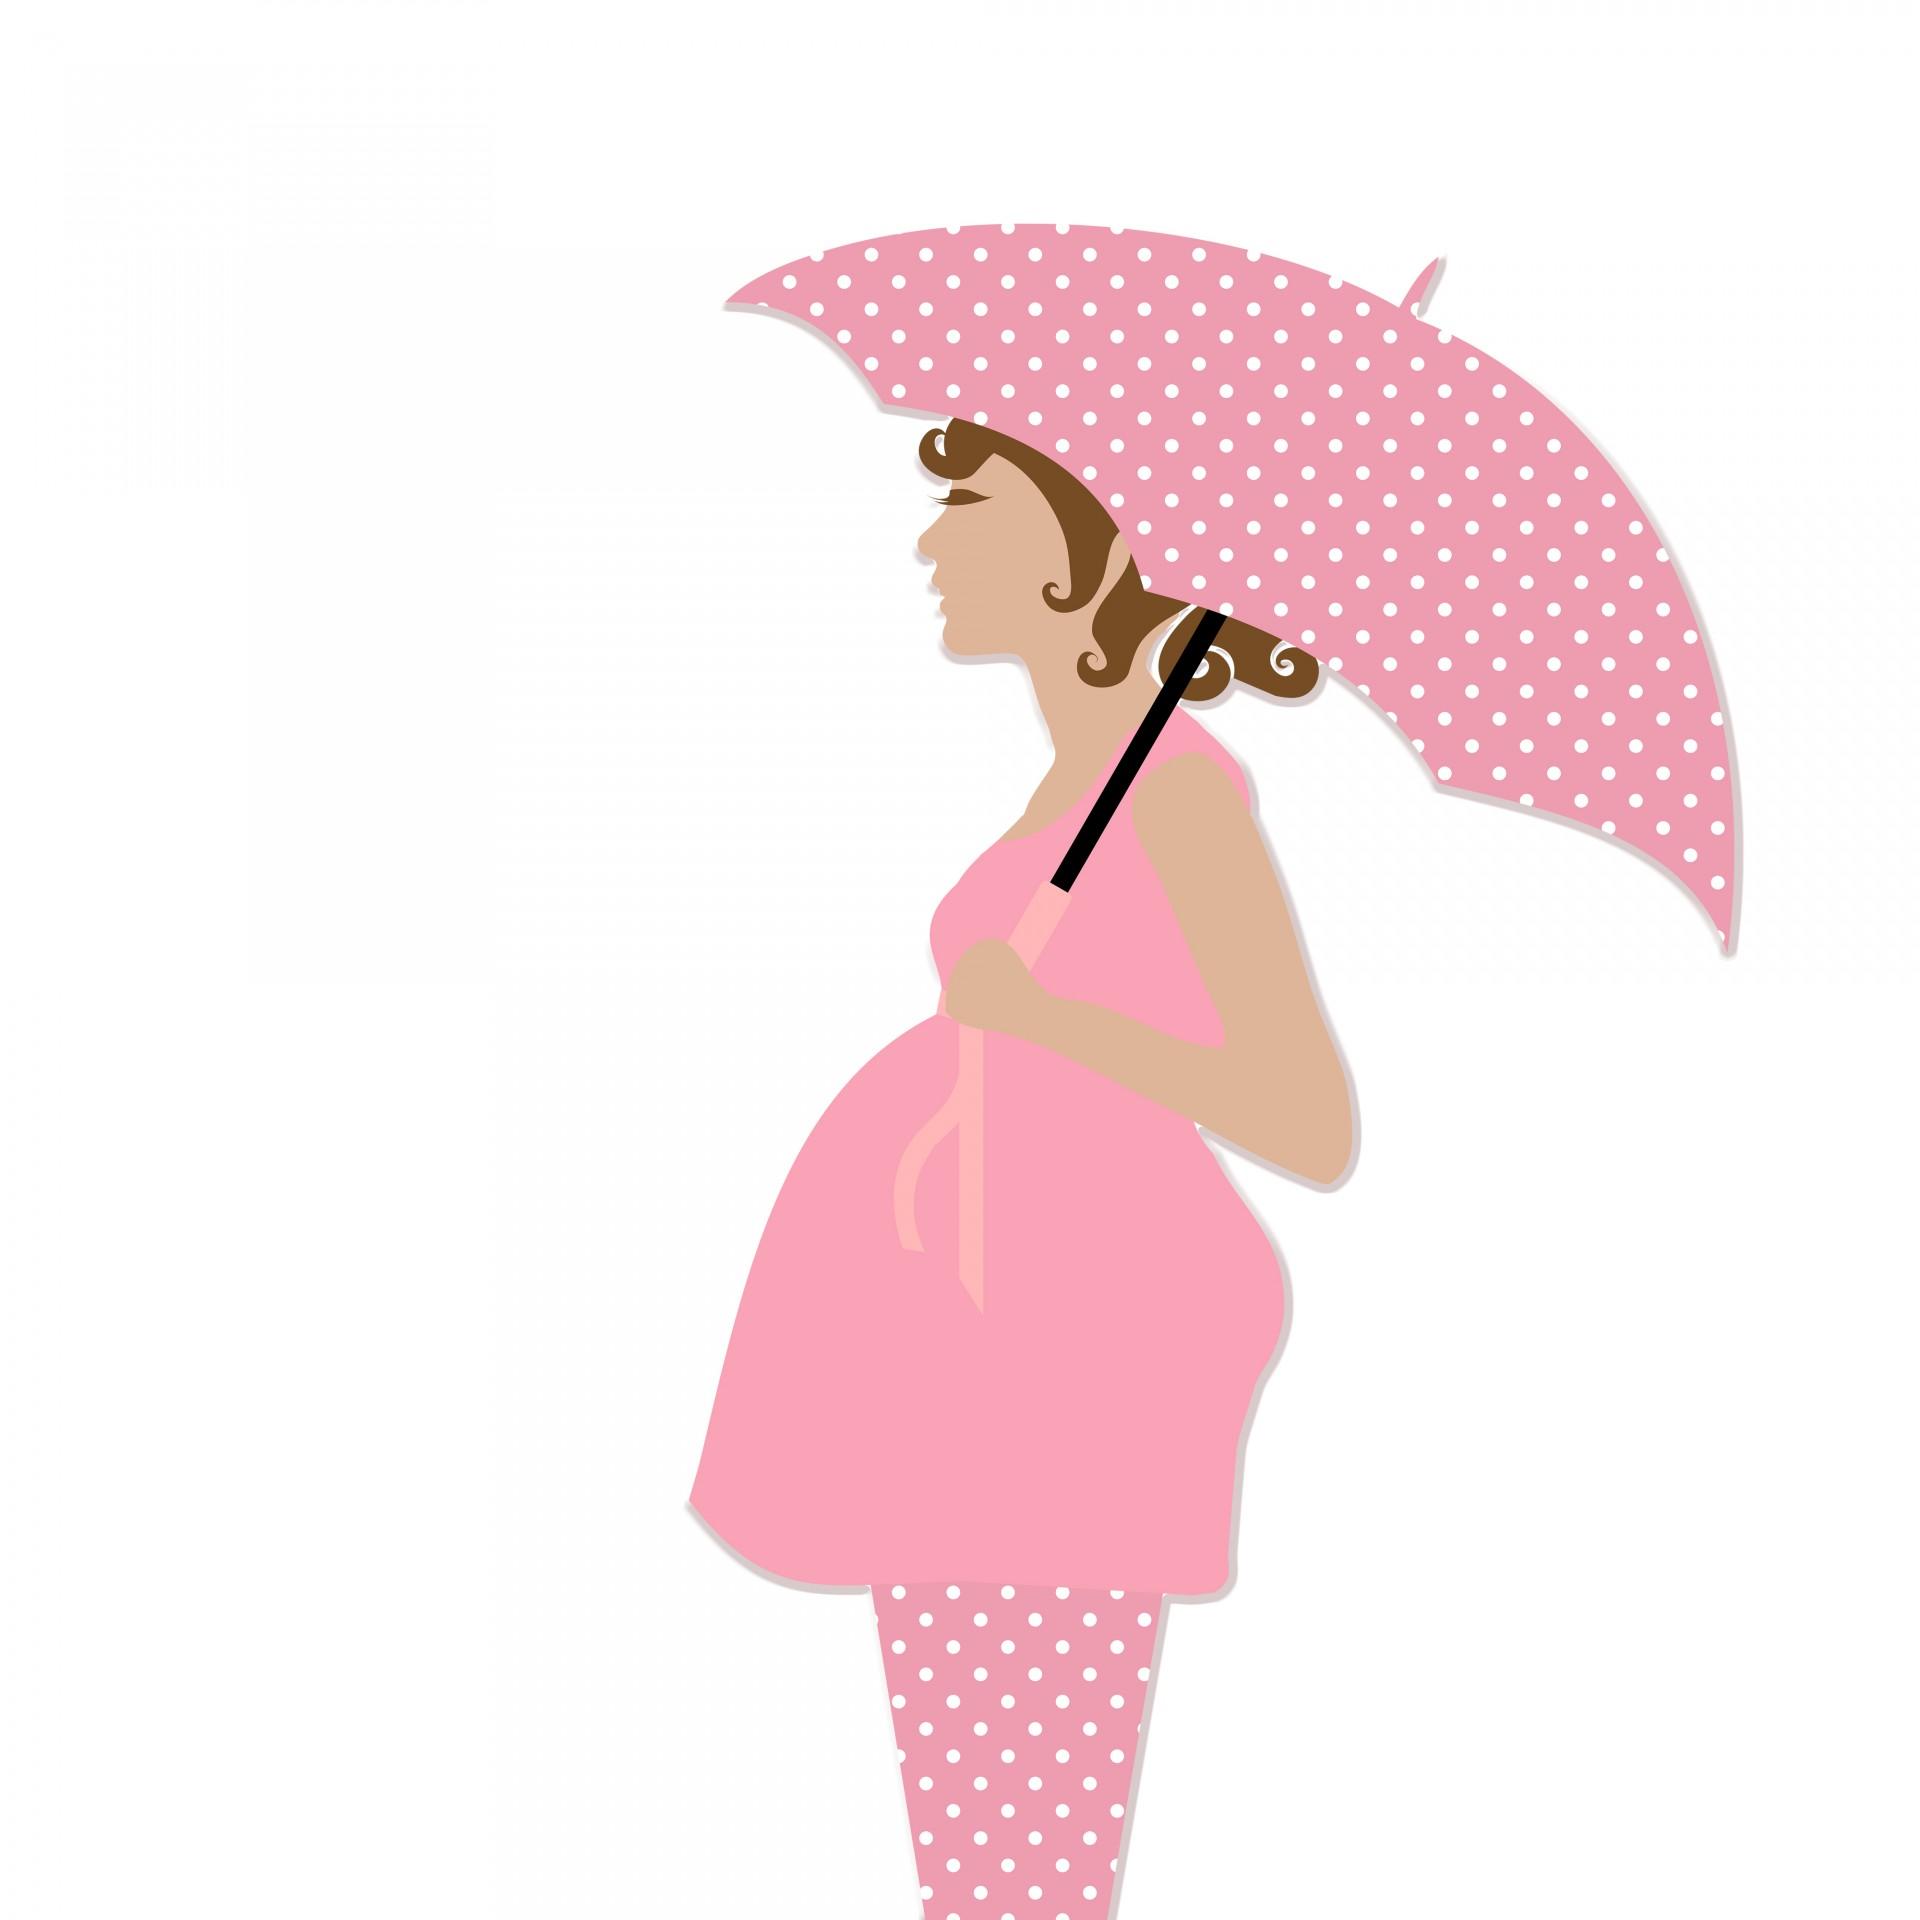 Clipart Pregnant Woman .-Clipart Pregnant Woman .-1